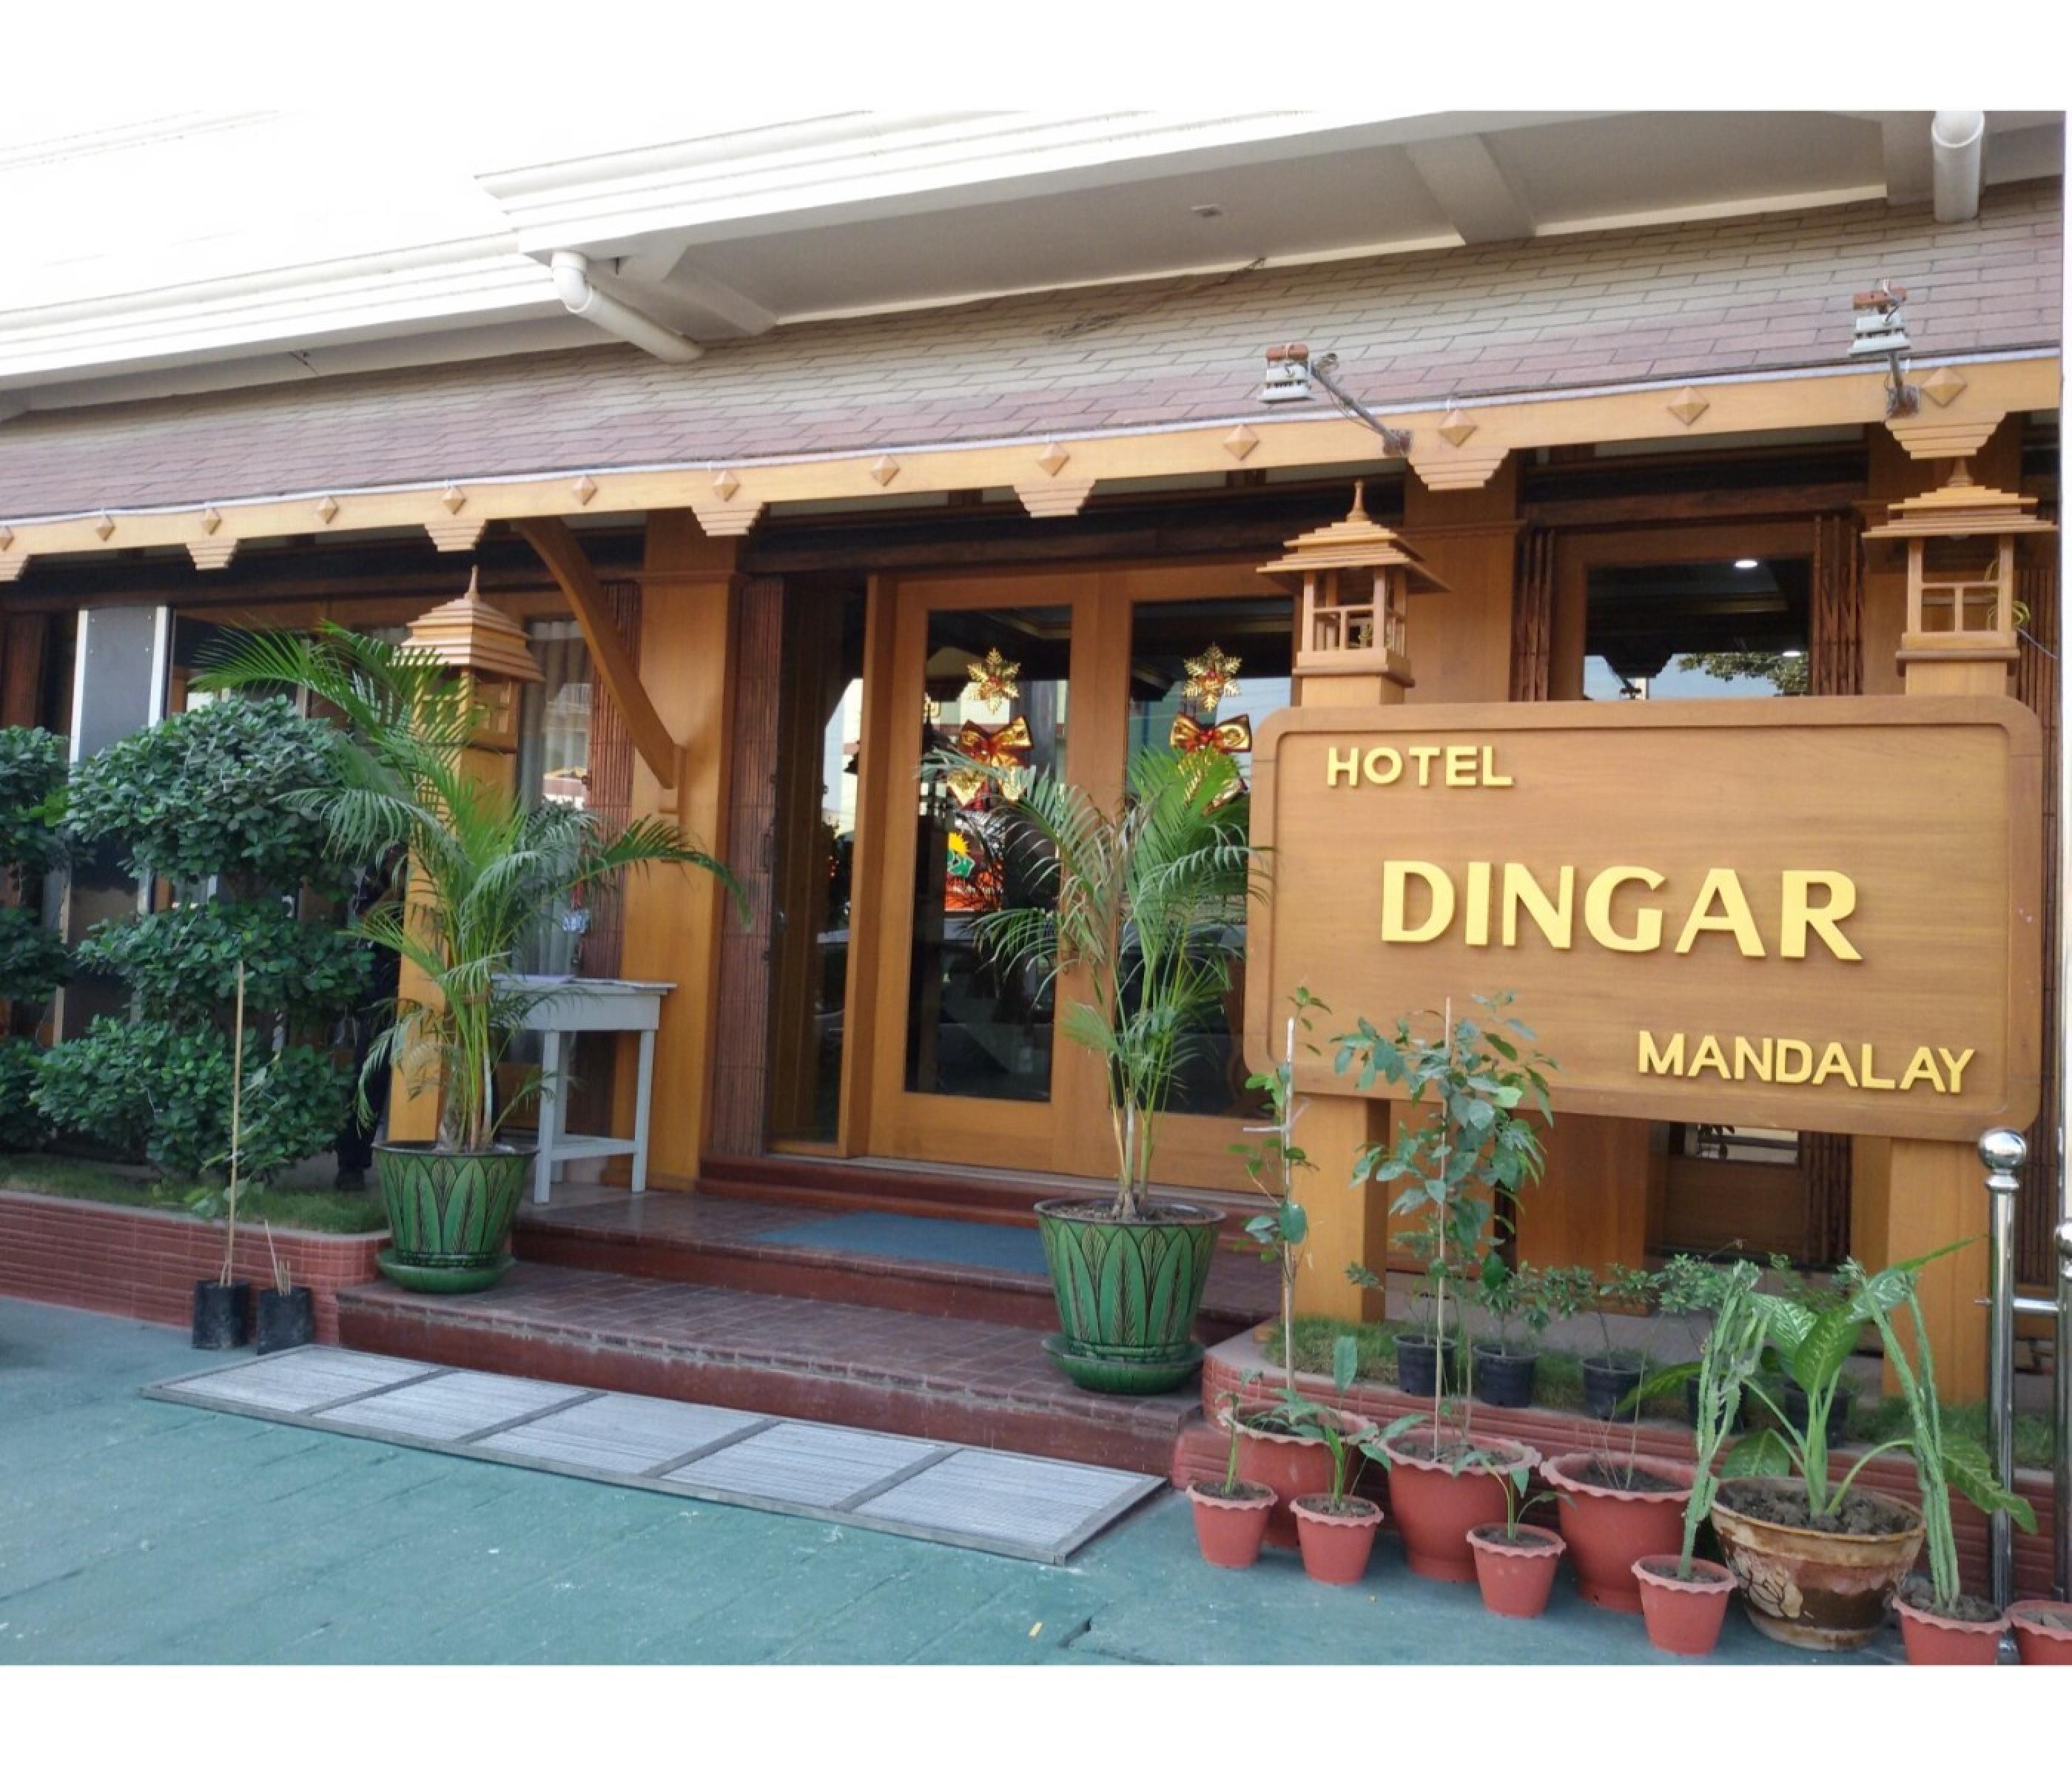 Dingar Hotel